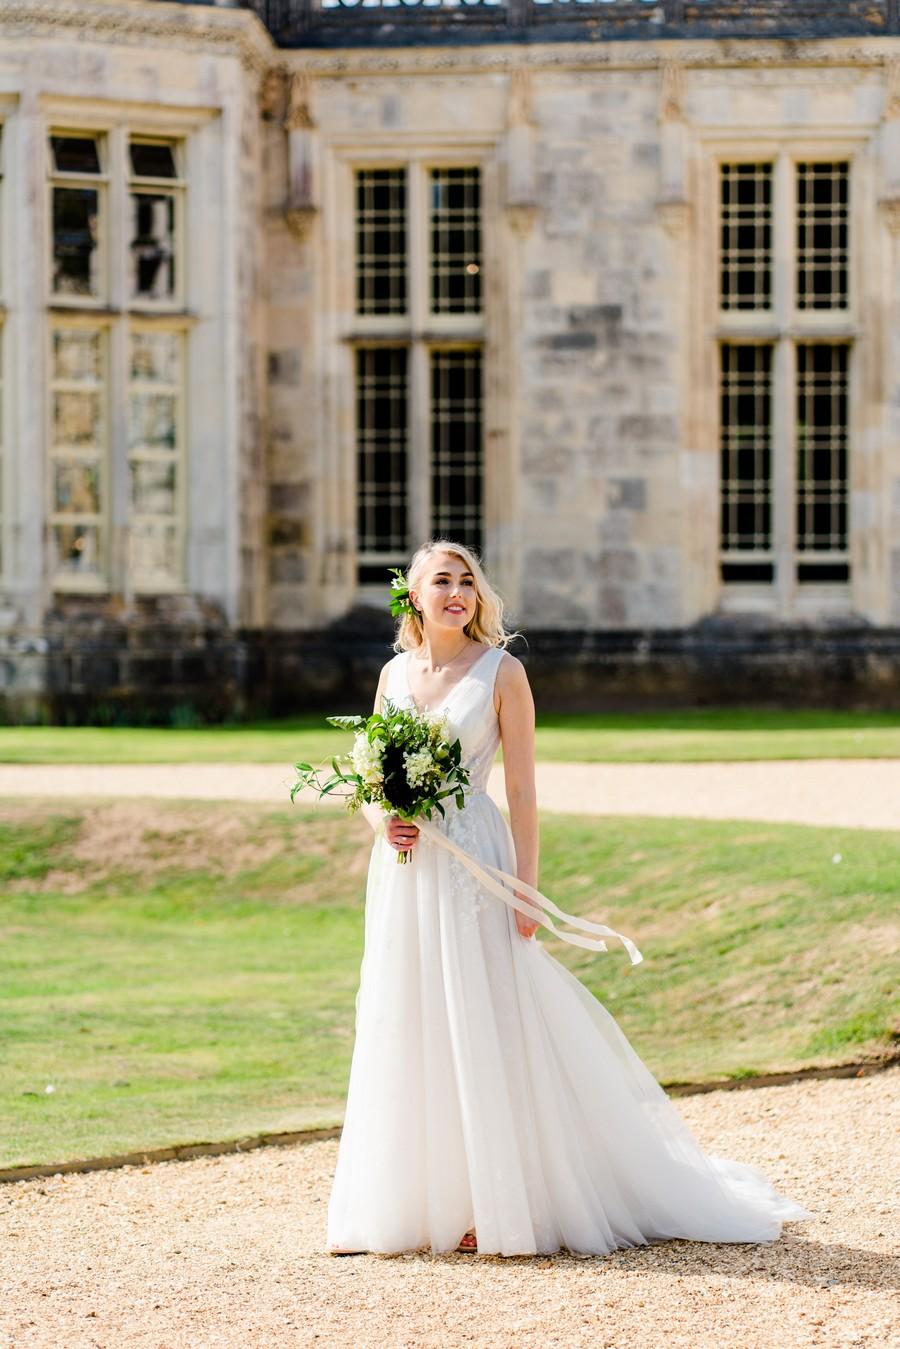 Highcliffe Castle wedding inspiration on the English Wedding Blog (35)